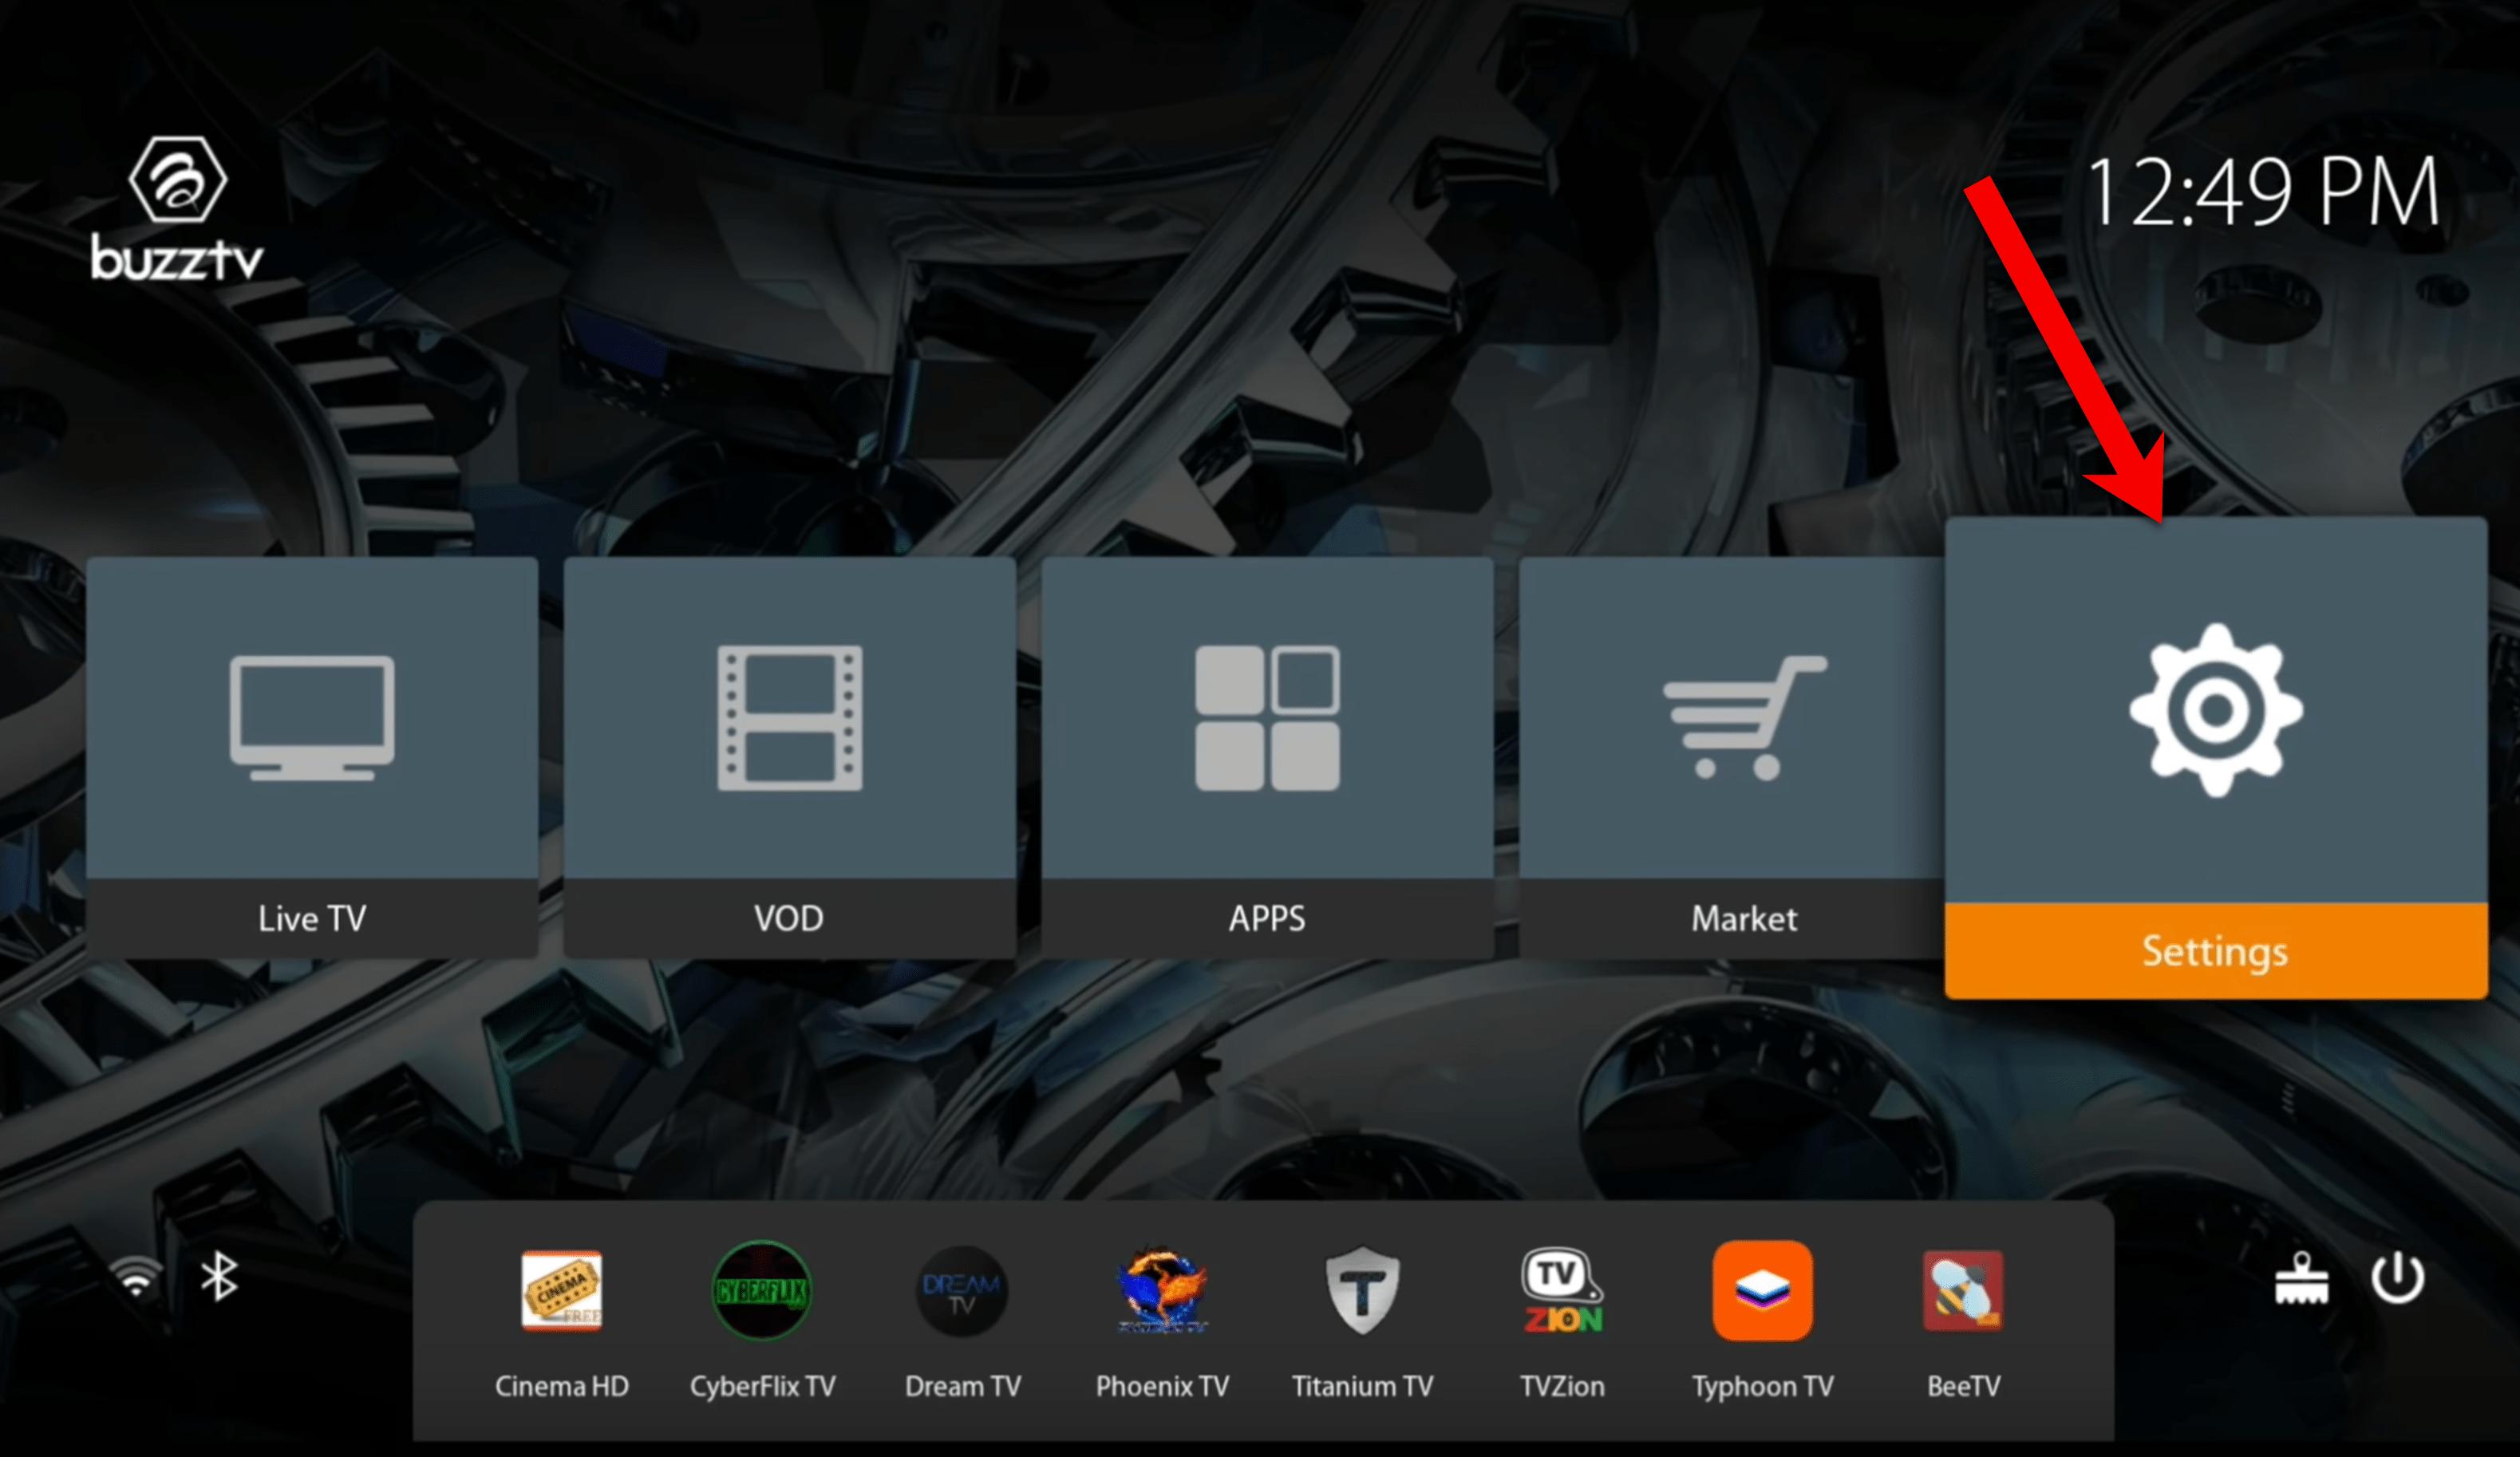 We Do Streaming! - How to setup IPTV on BuzzTV XPL3000 box?